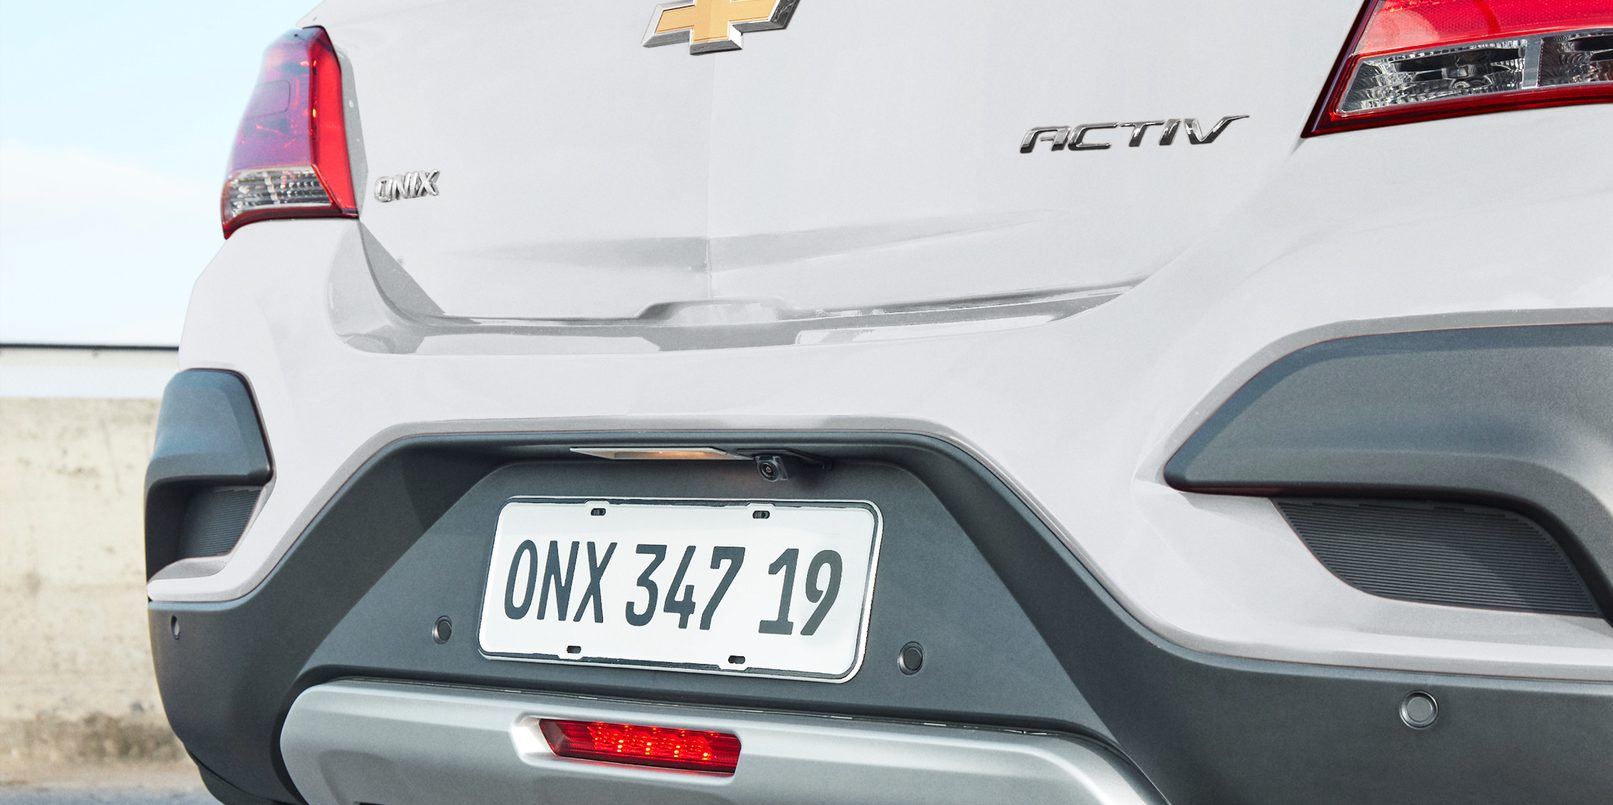 Onix Activ   VIAMAR CHEVROLET f147603350